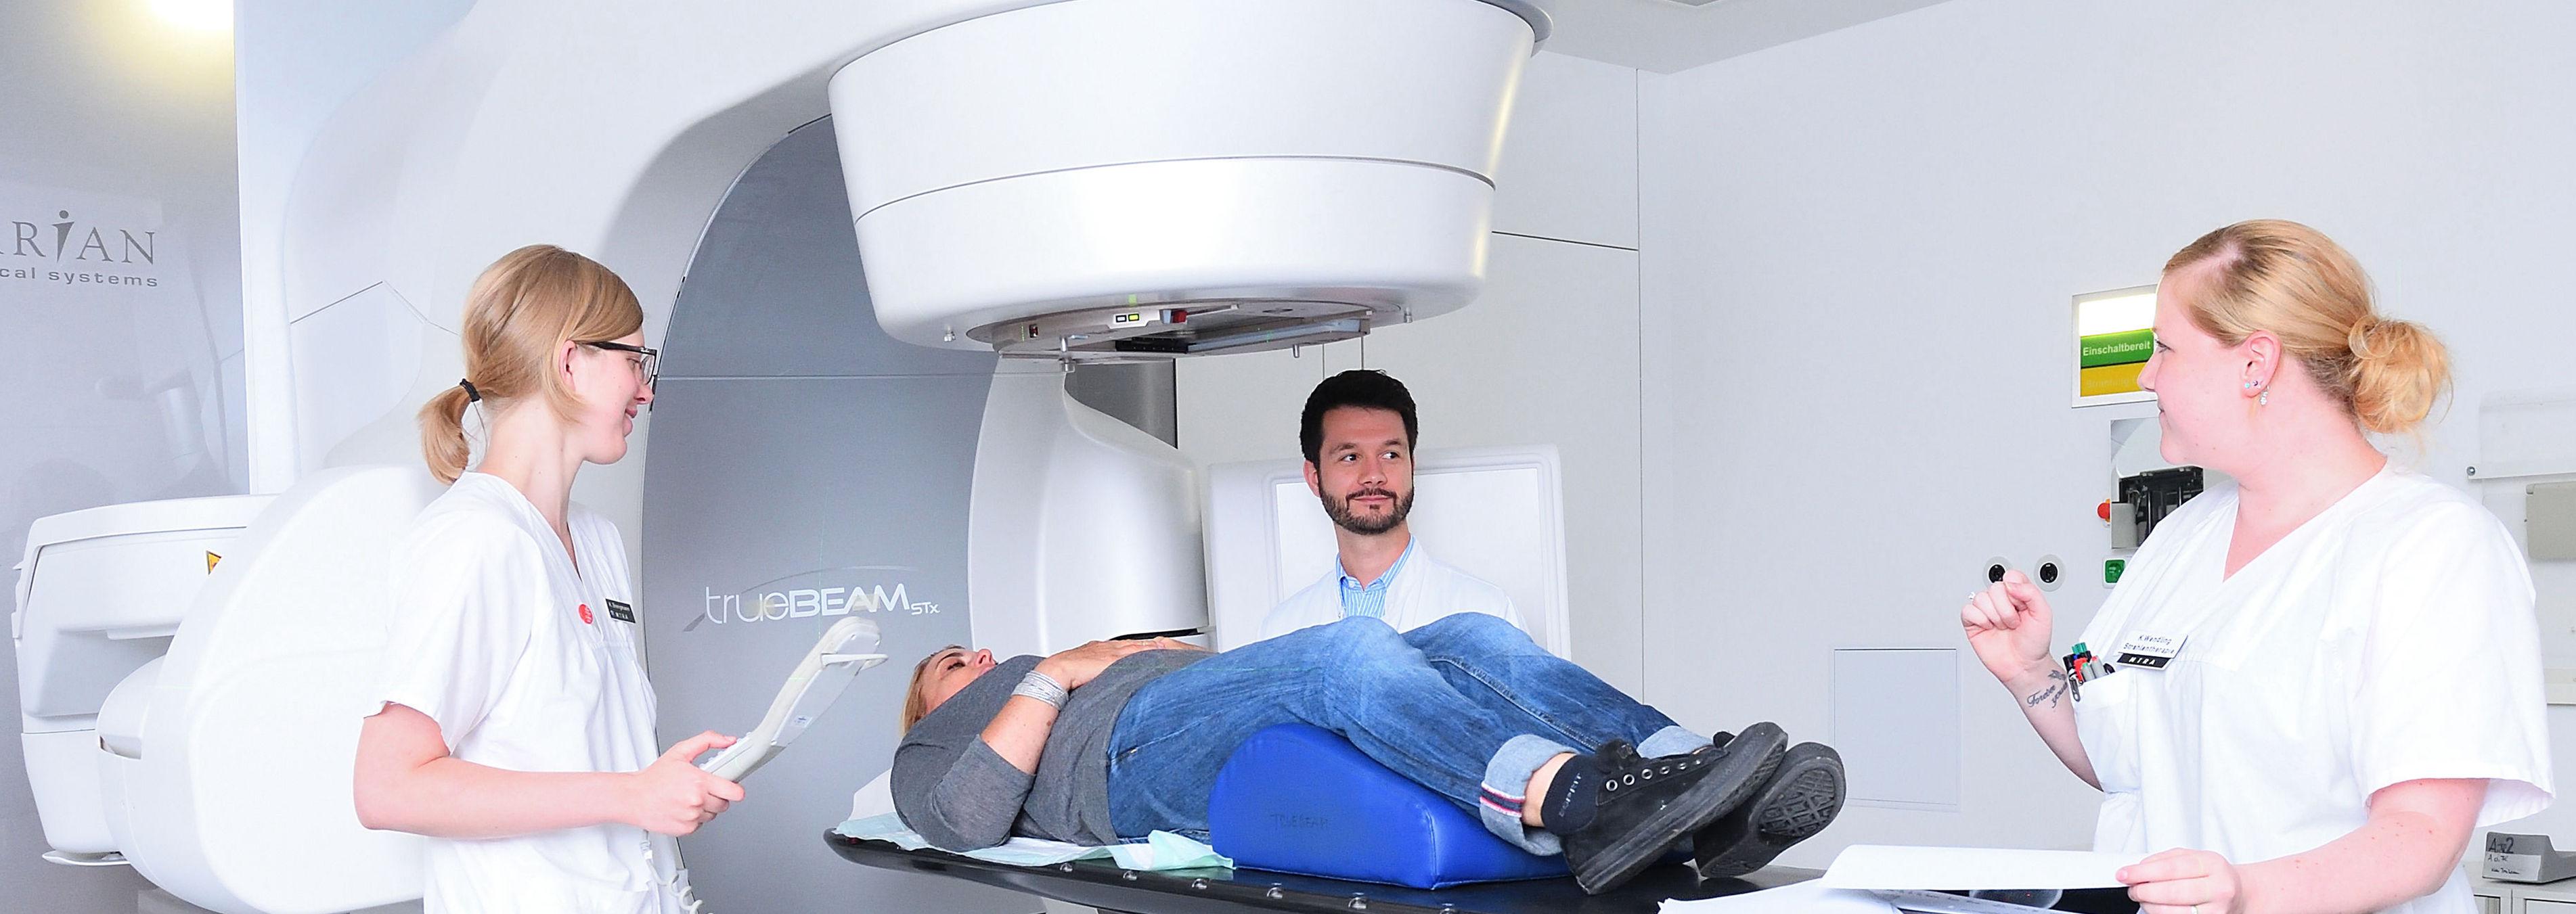 Strahlentherapie Uniklinik Köln